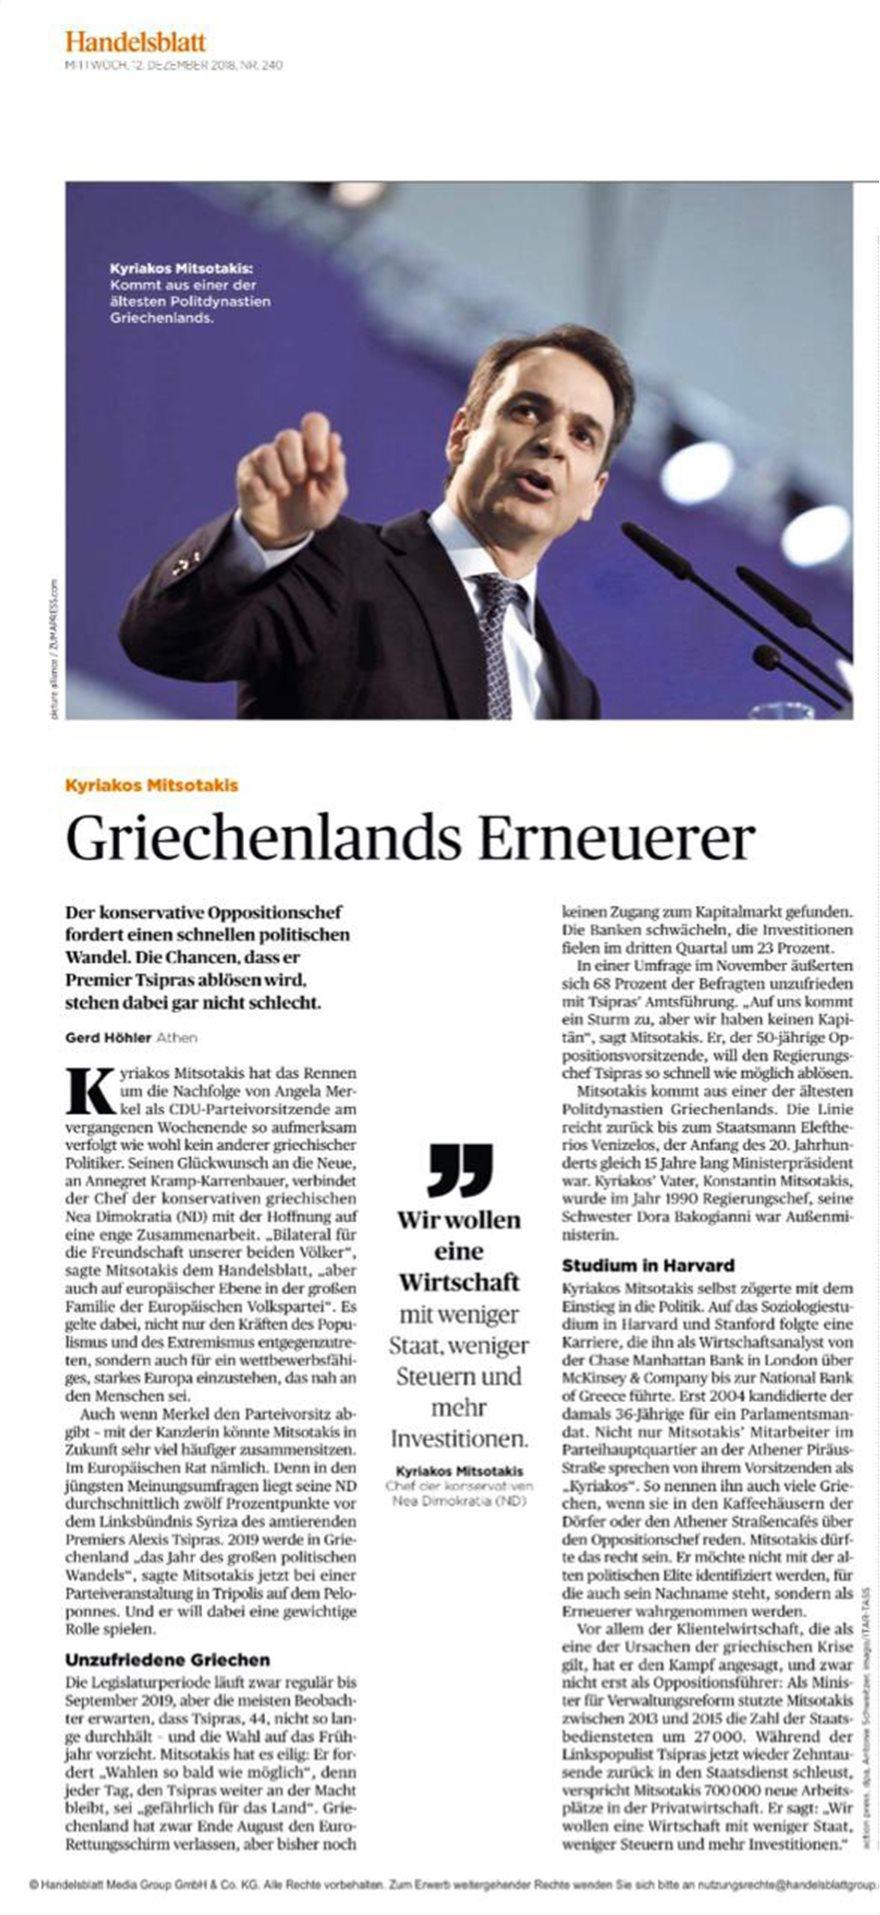 Handelsblatt: Γιατί ο Μητσοτάκης μπορεί να αντικαταστήσει τον Αλέξη Τσίπρα - Φωτογραφία 2